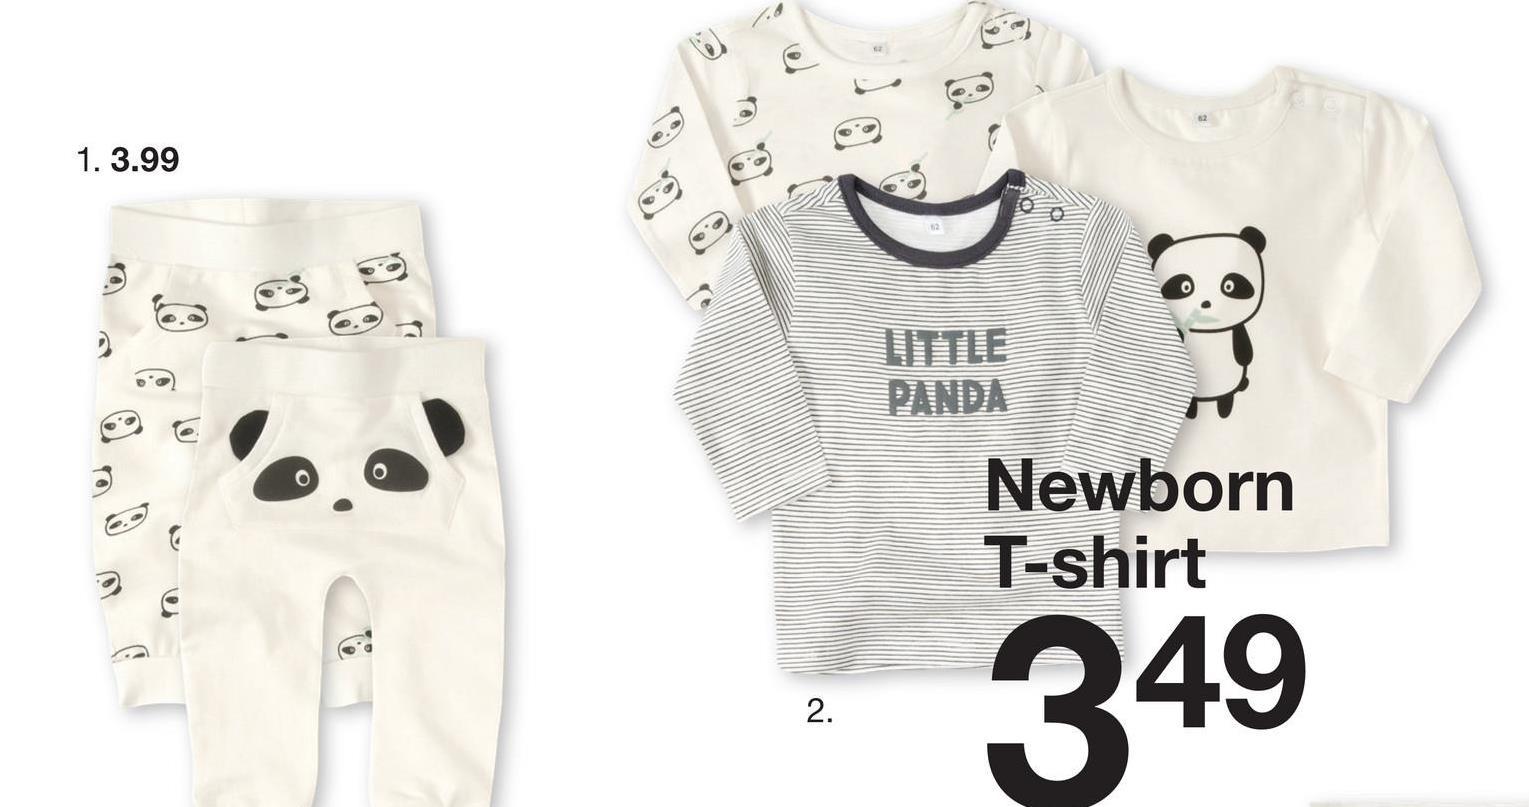 ) 1. 3.99 Newborn T-shirt 349